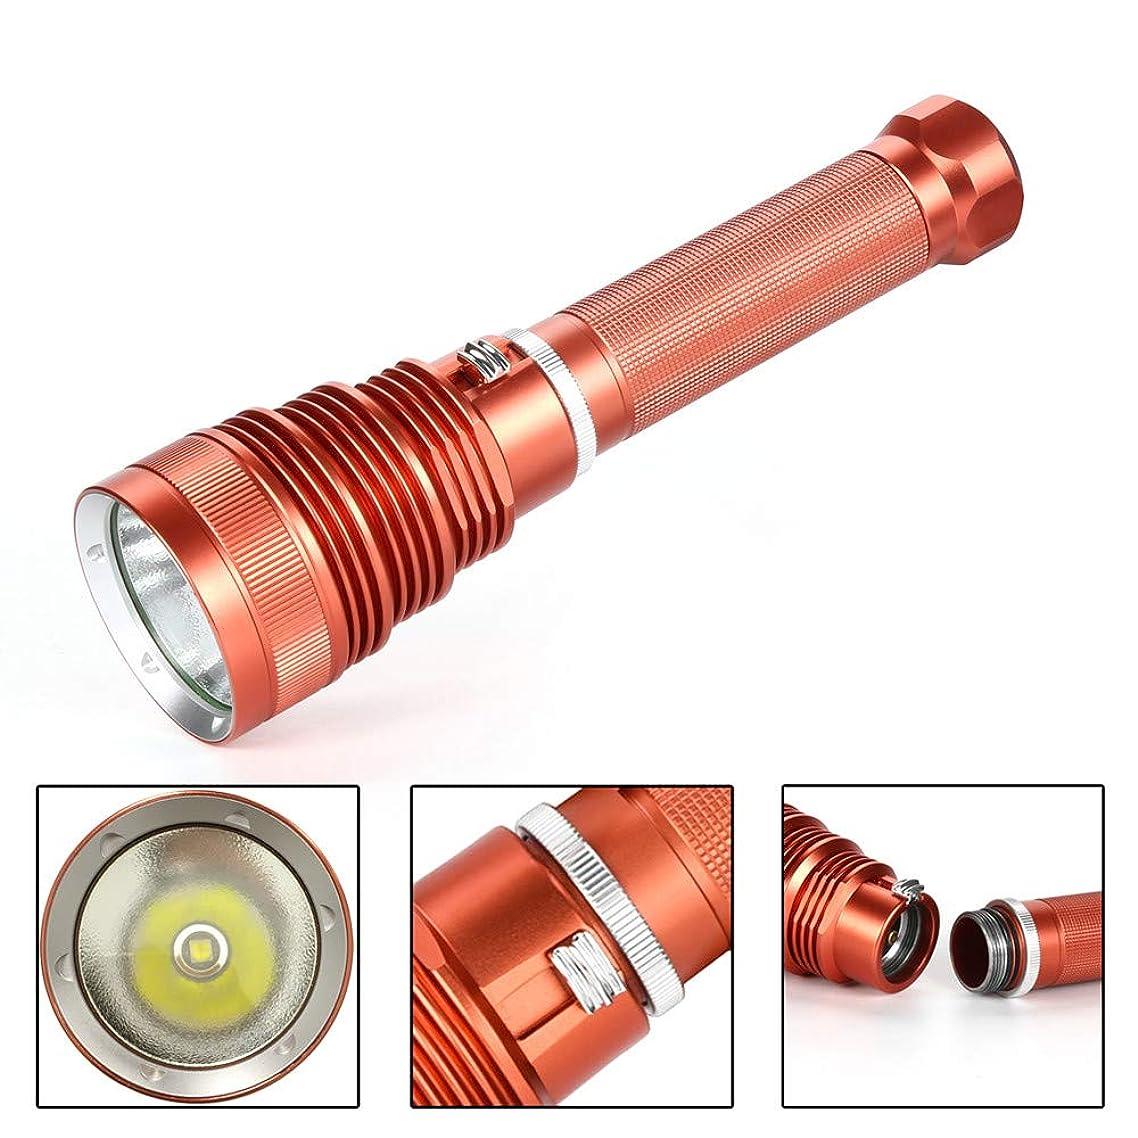 Rose Gold, Ikevan Diving Flashlight L2 Underwater Torch Brightness Waterproof 100m Light Torch